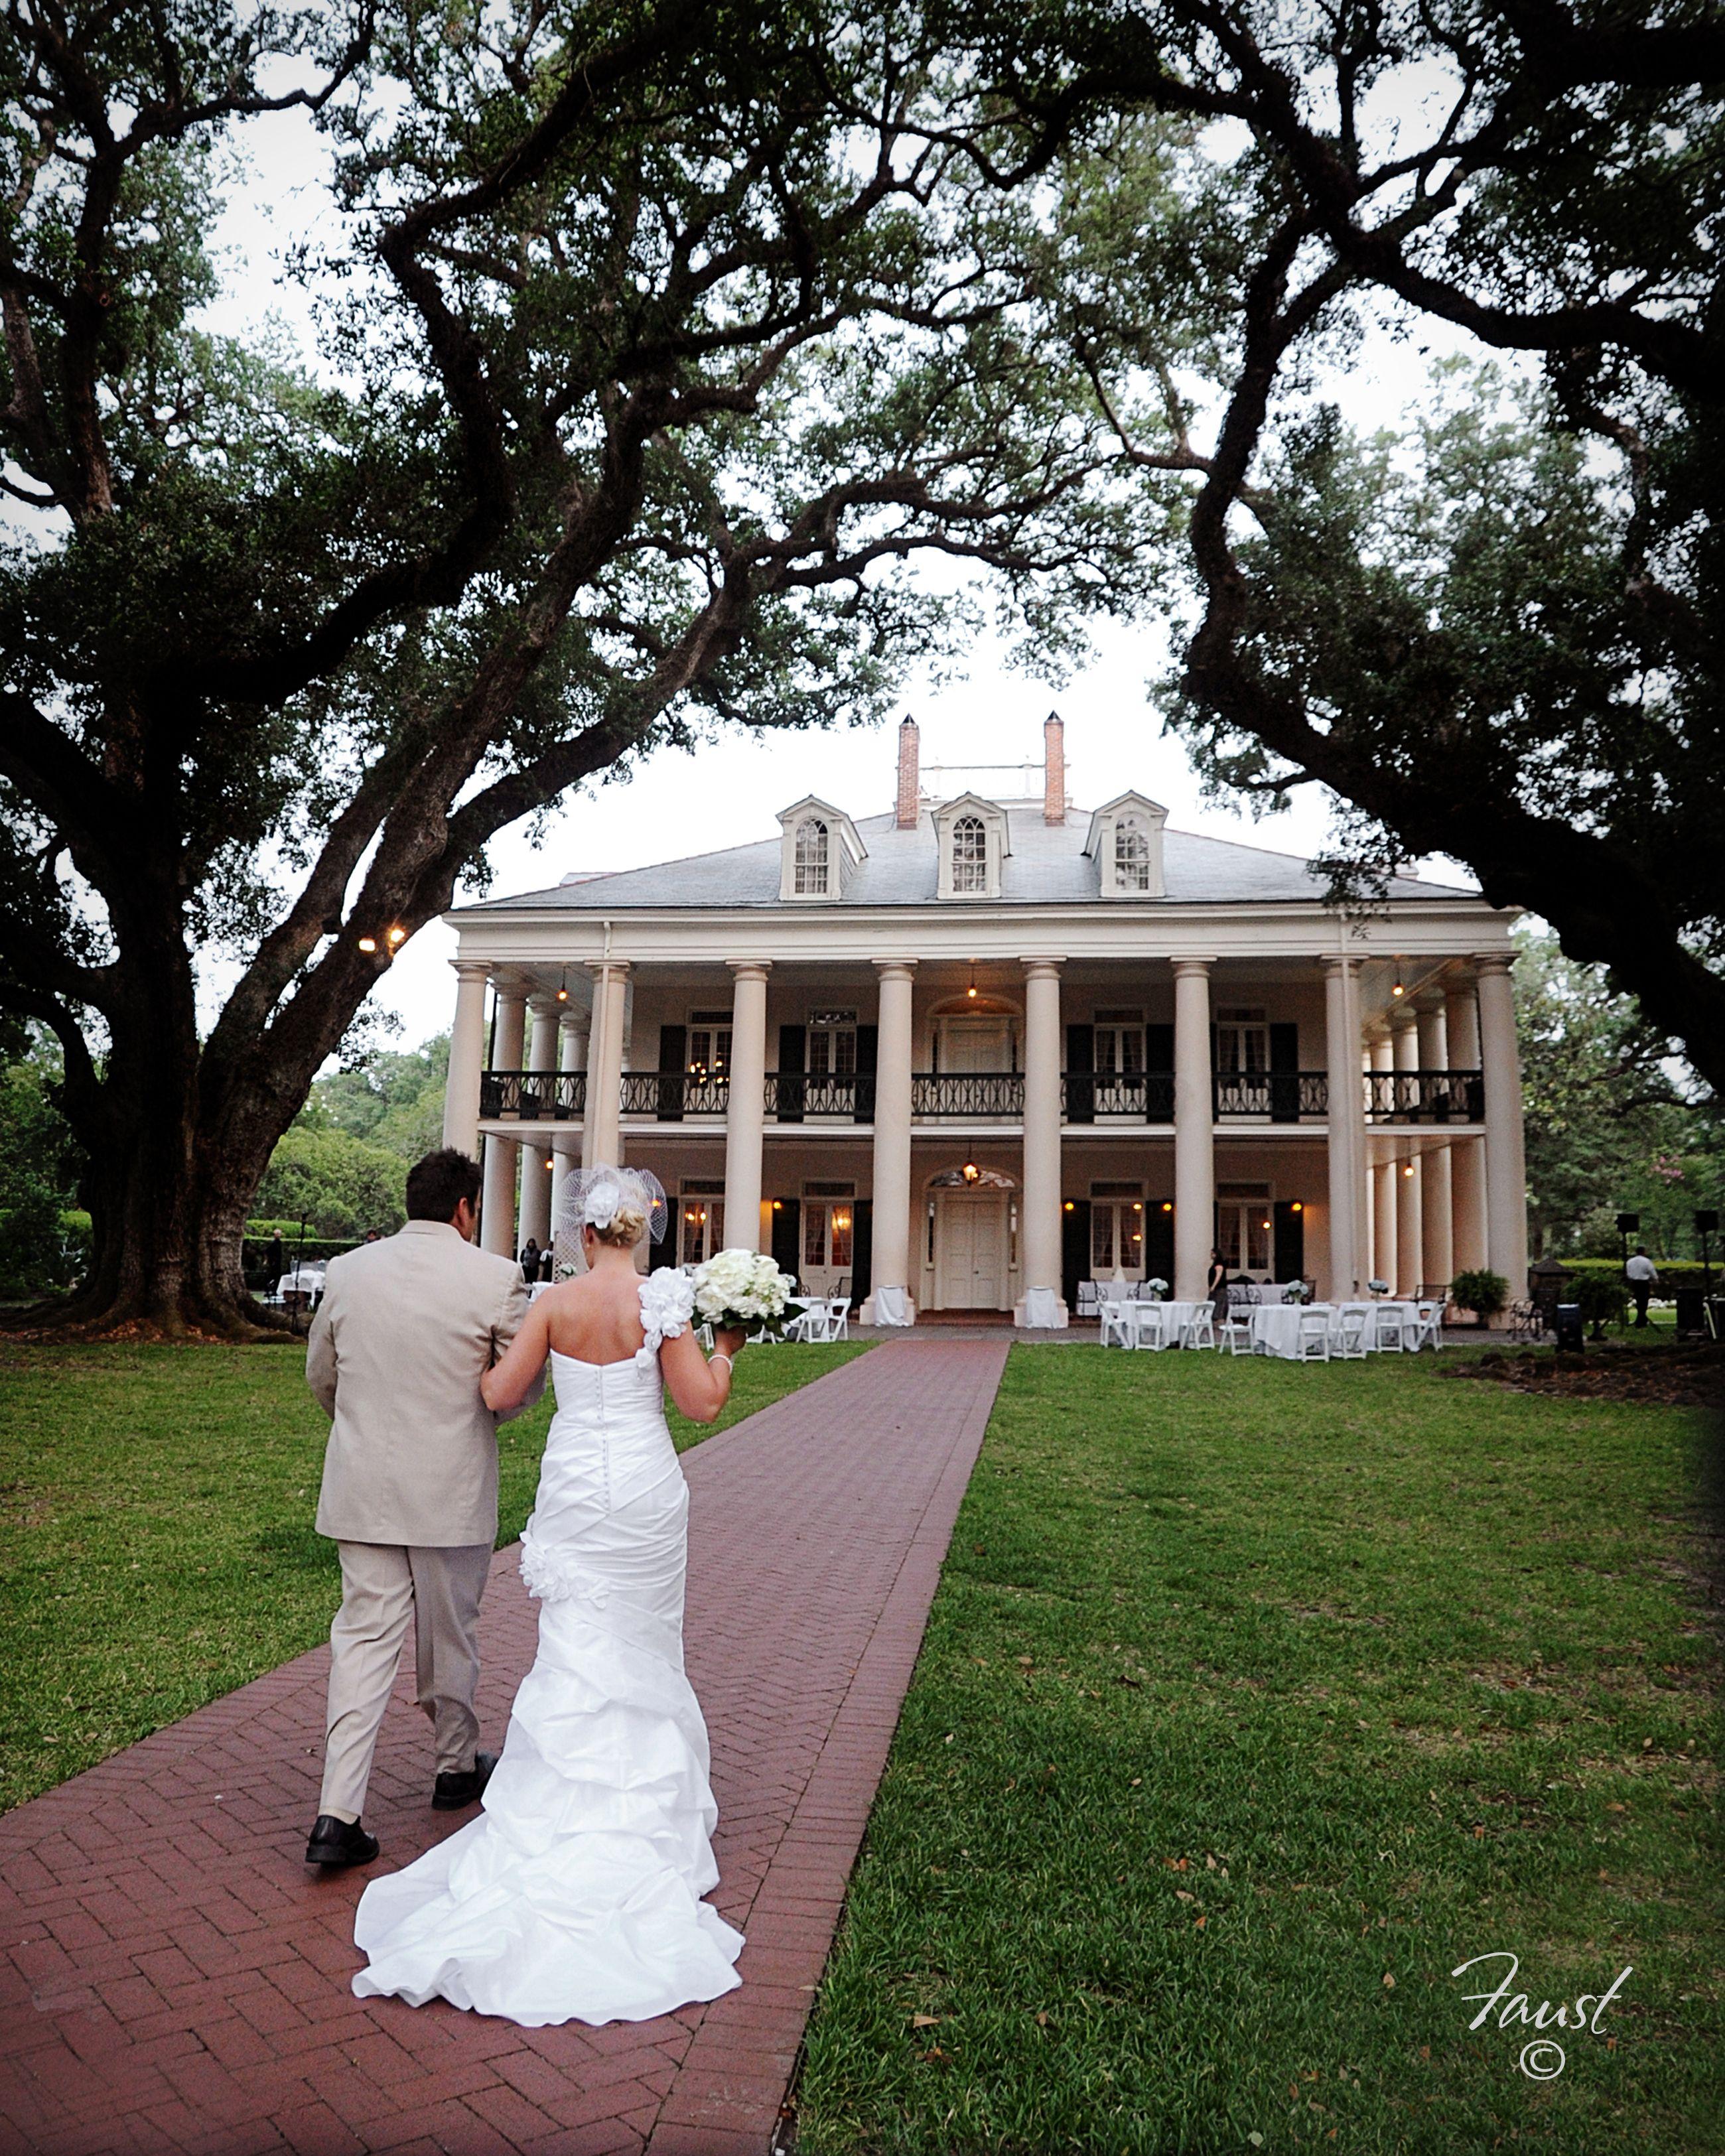 Oak alley plantation my dream home pinterest weddings